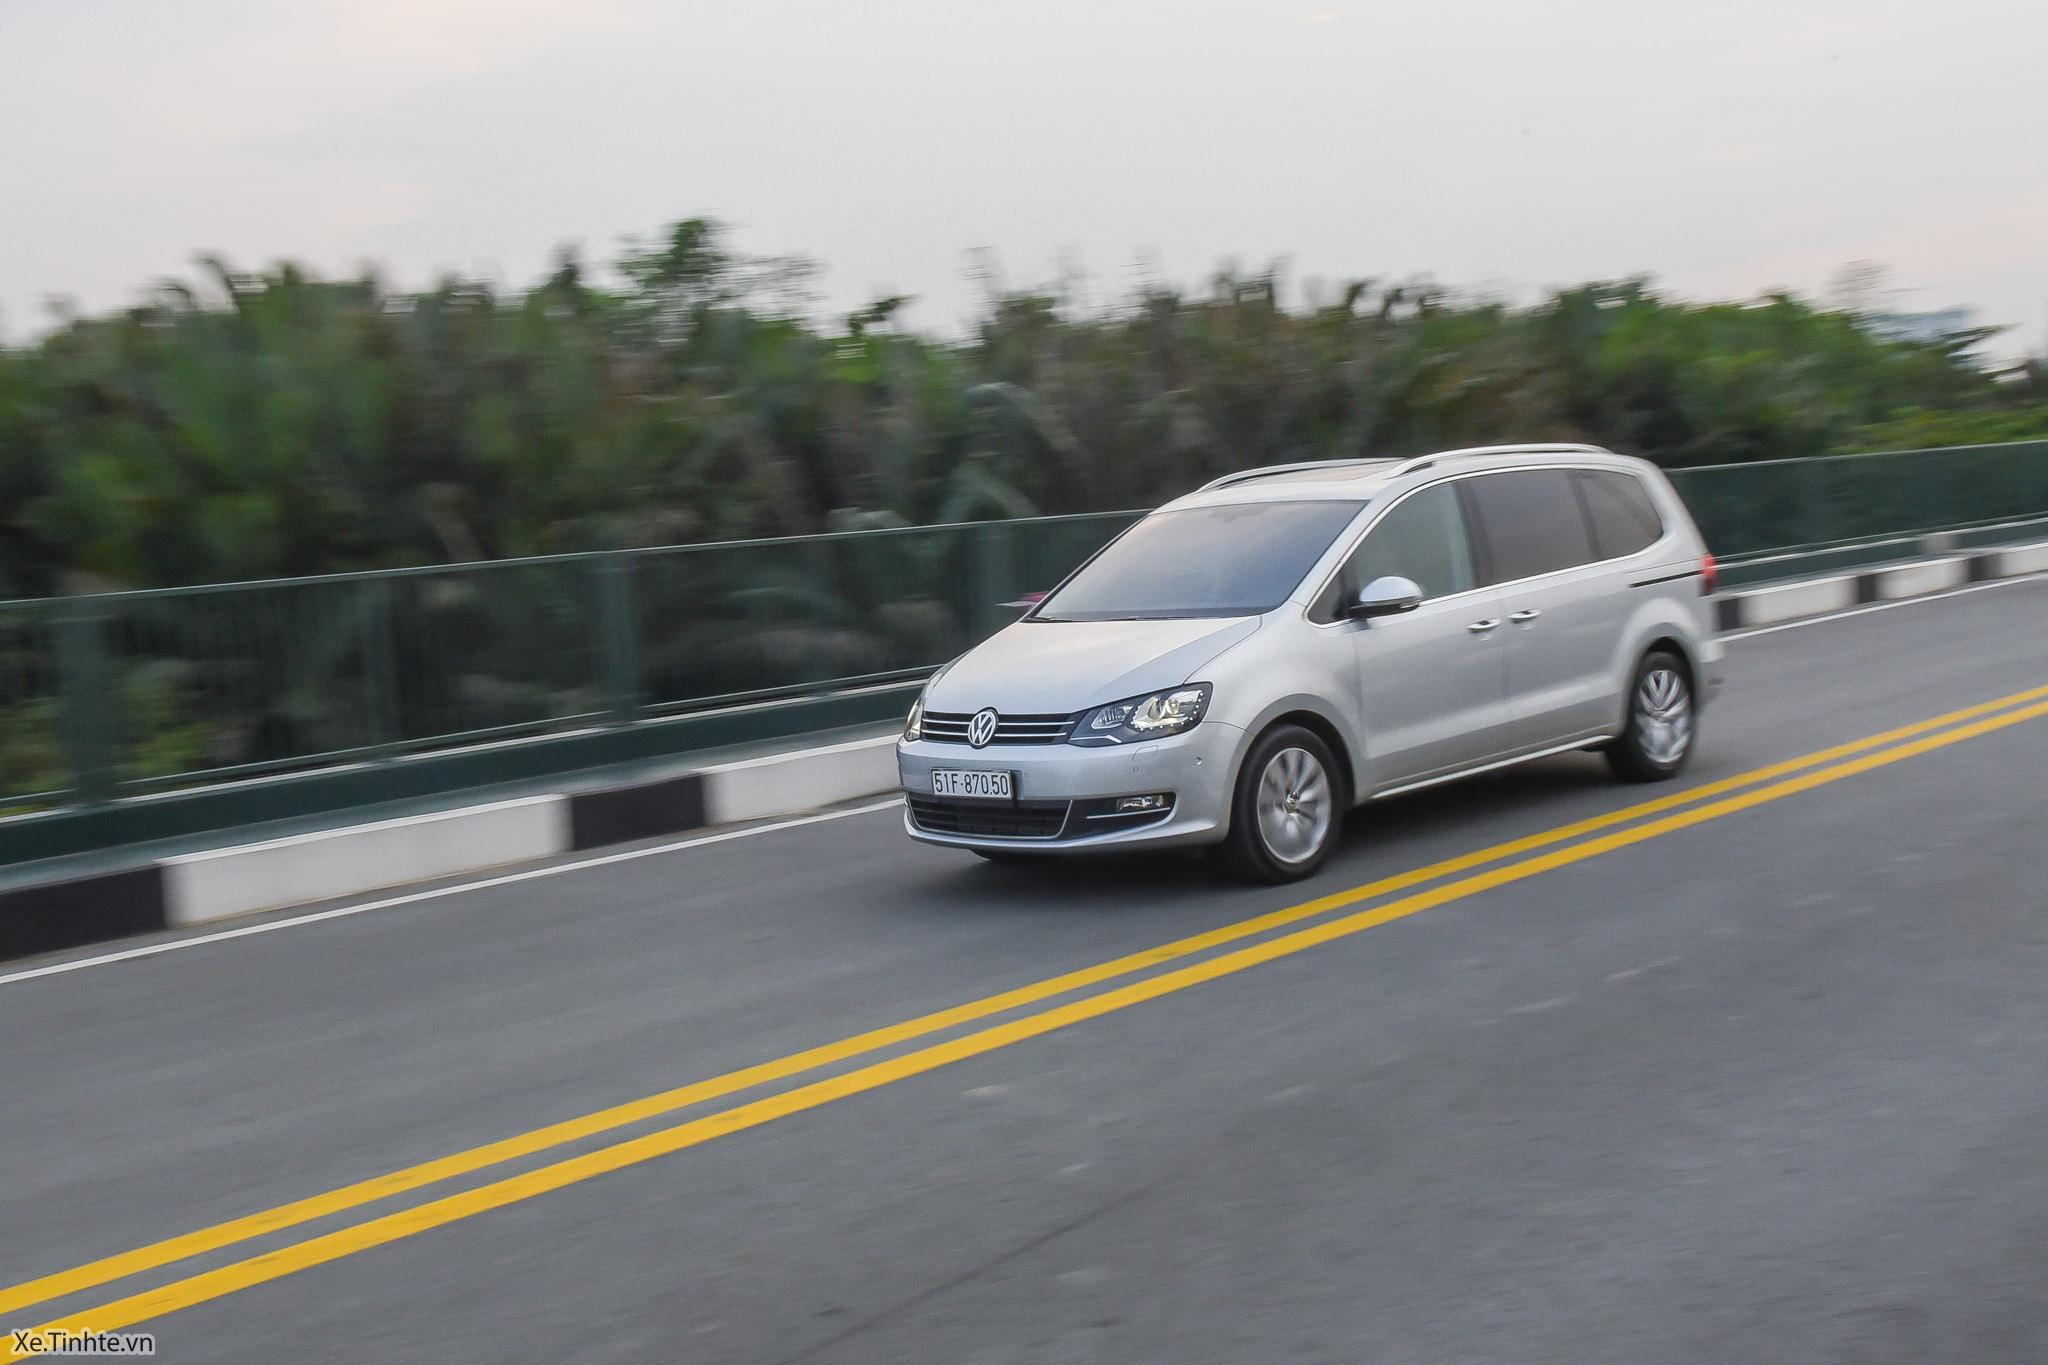 Volkswagen_Sharan_Xe_Tinhte_126.jpg